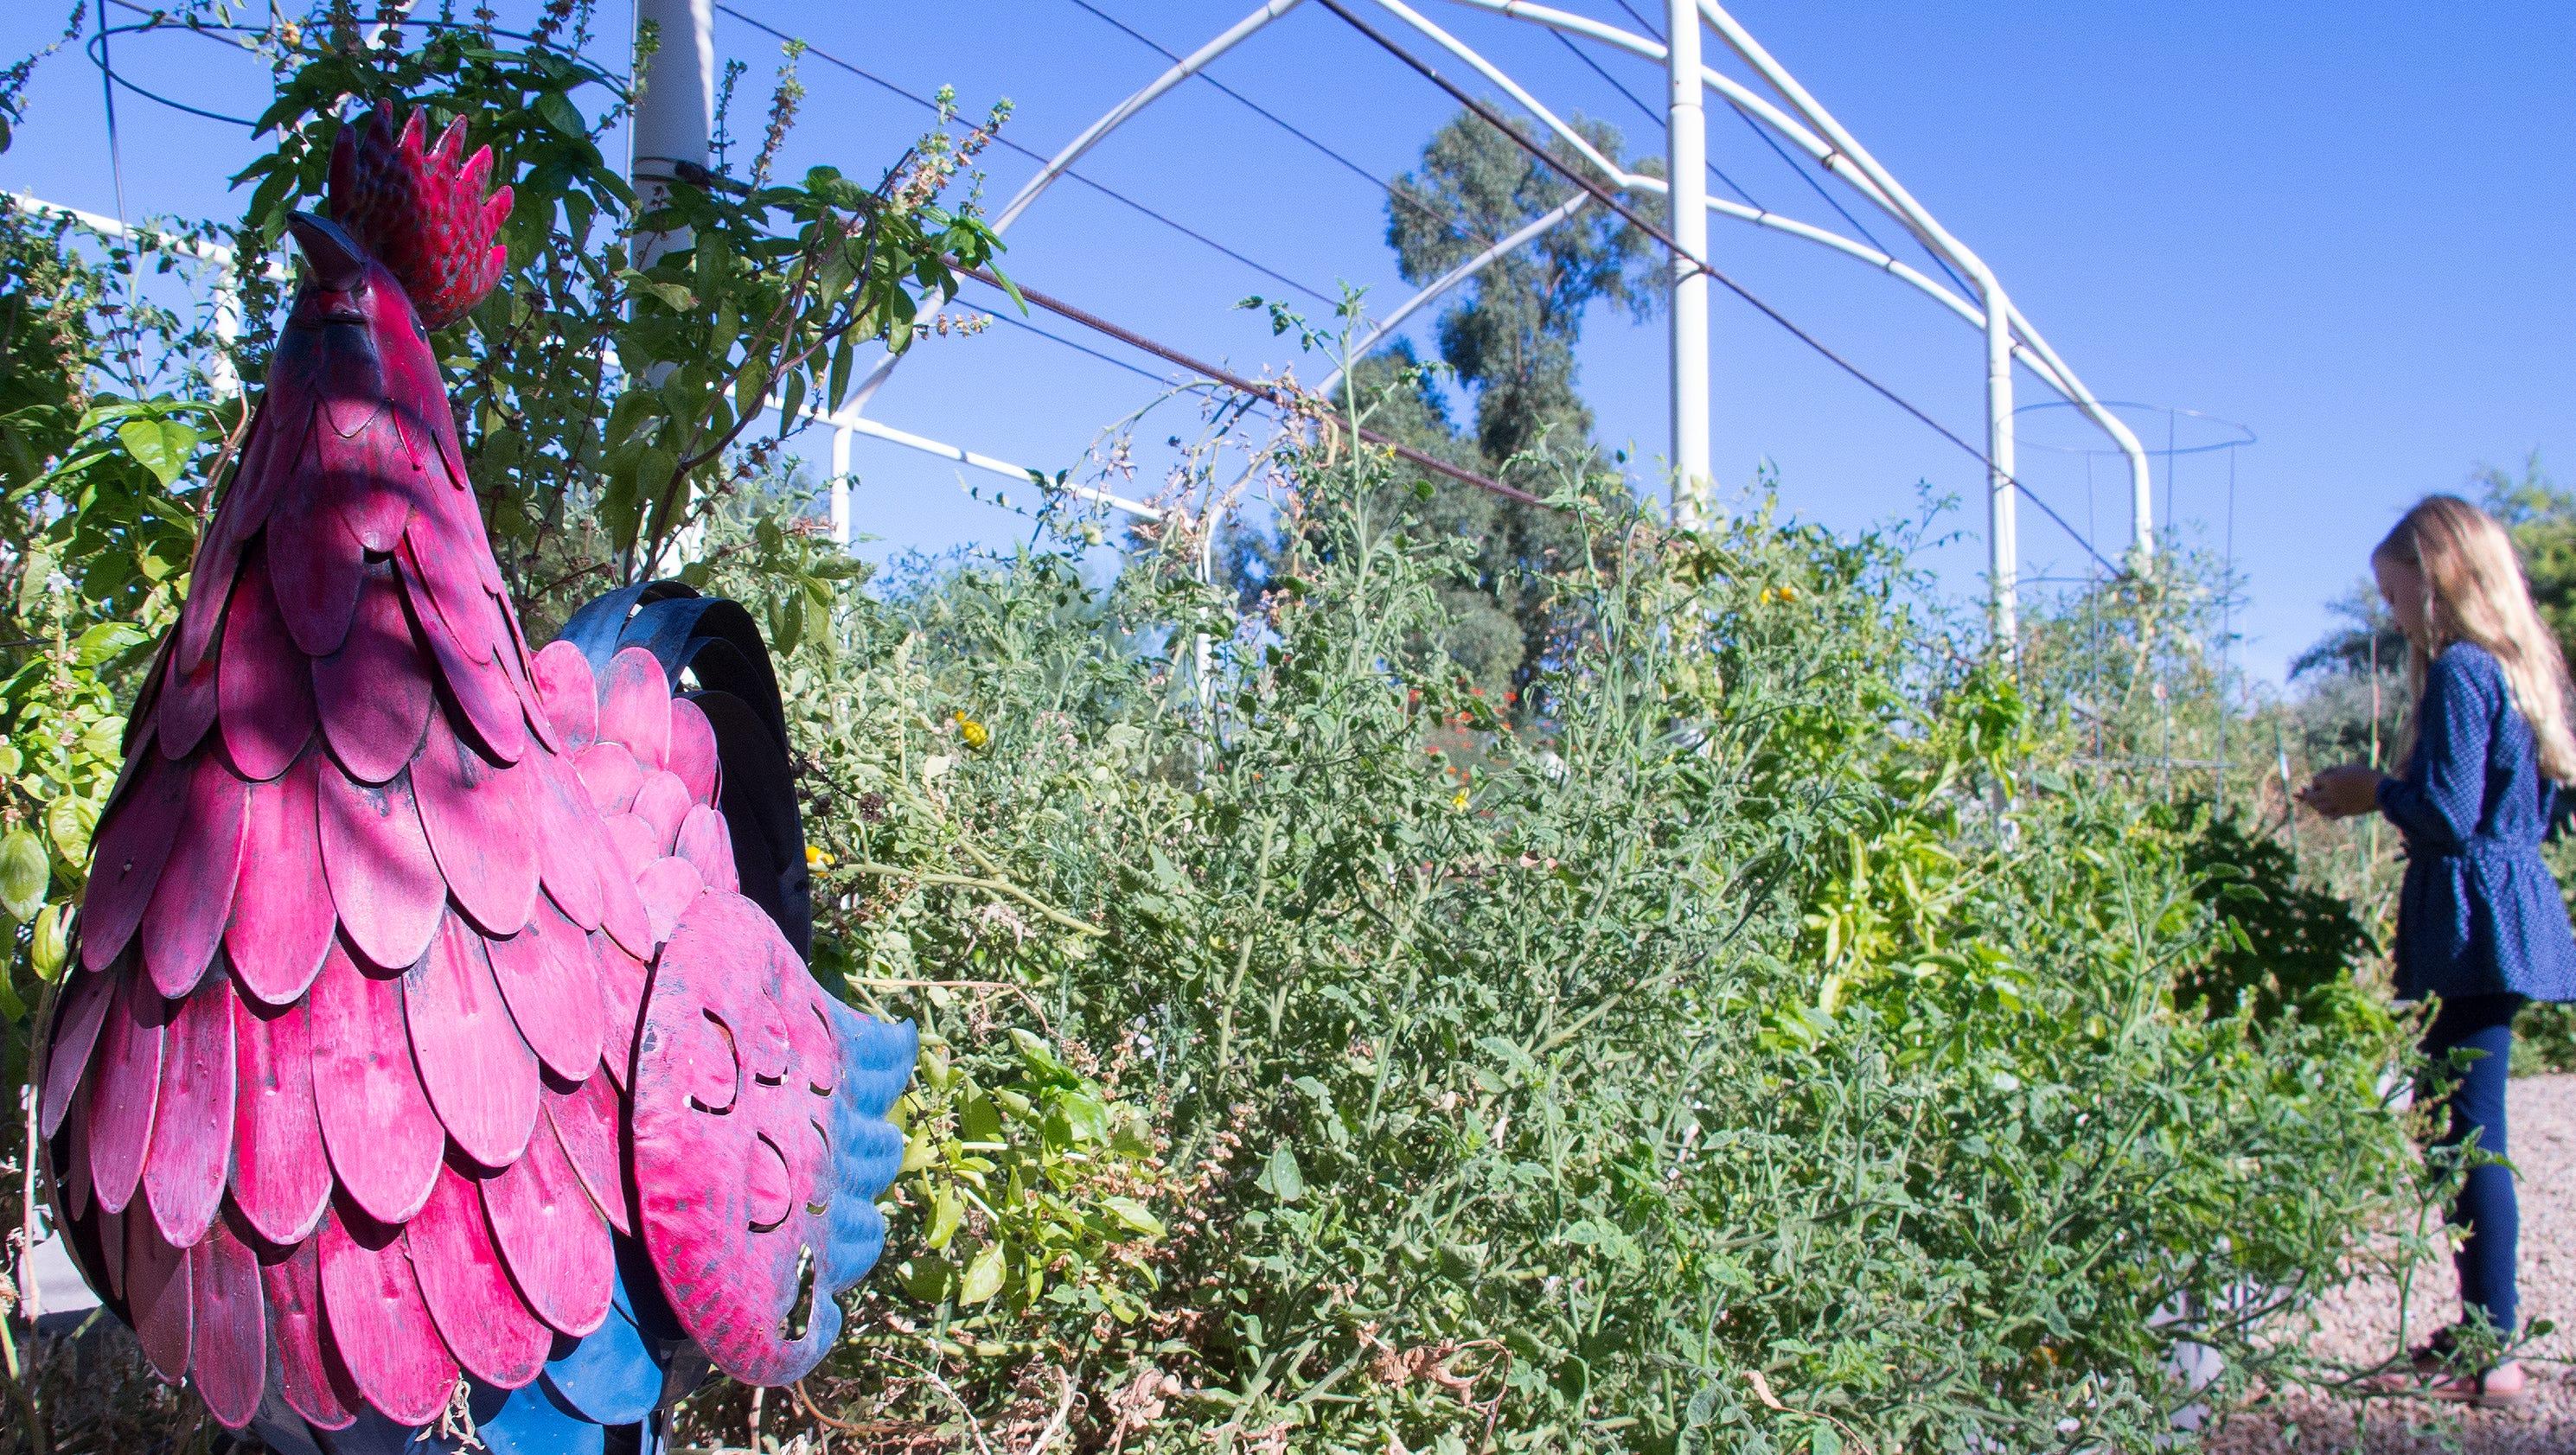 Craigslist Santa Fe Farm And Garden - Garden Ideas ~ erikasmith.net